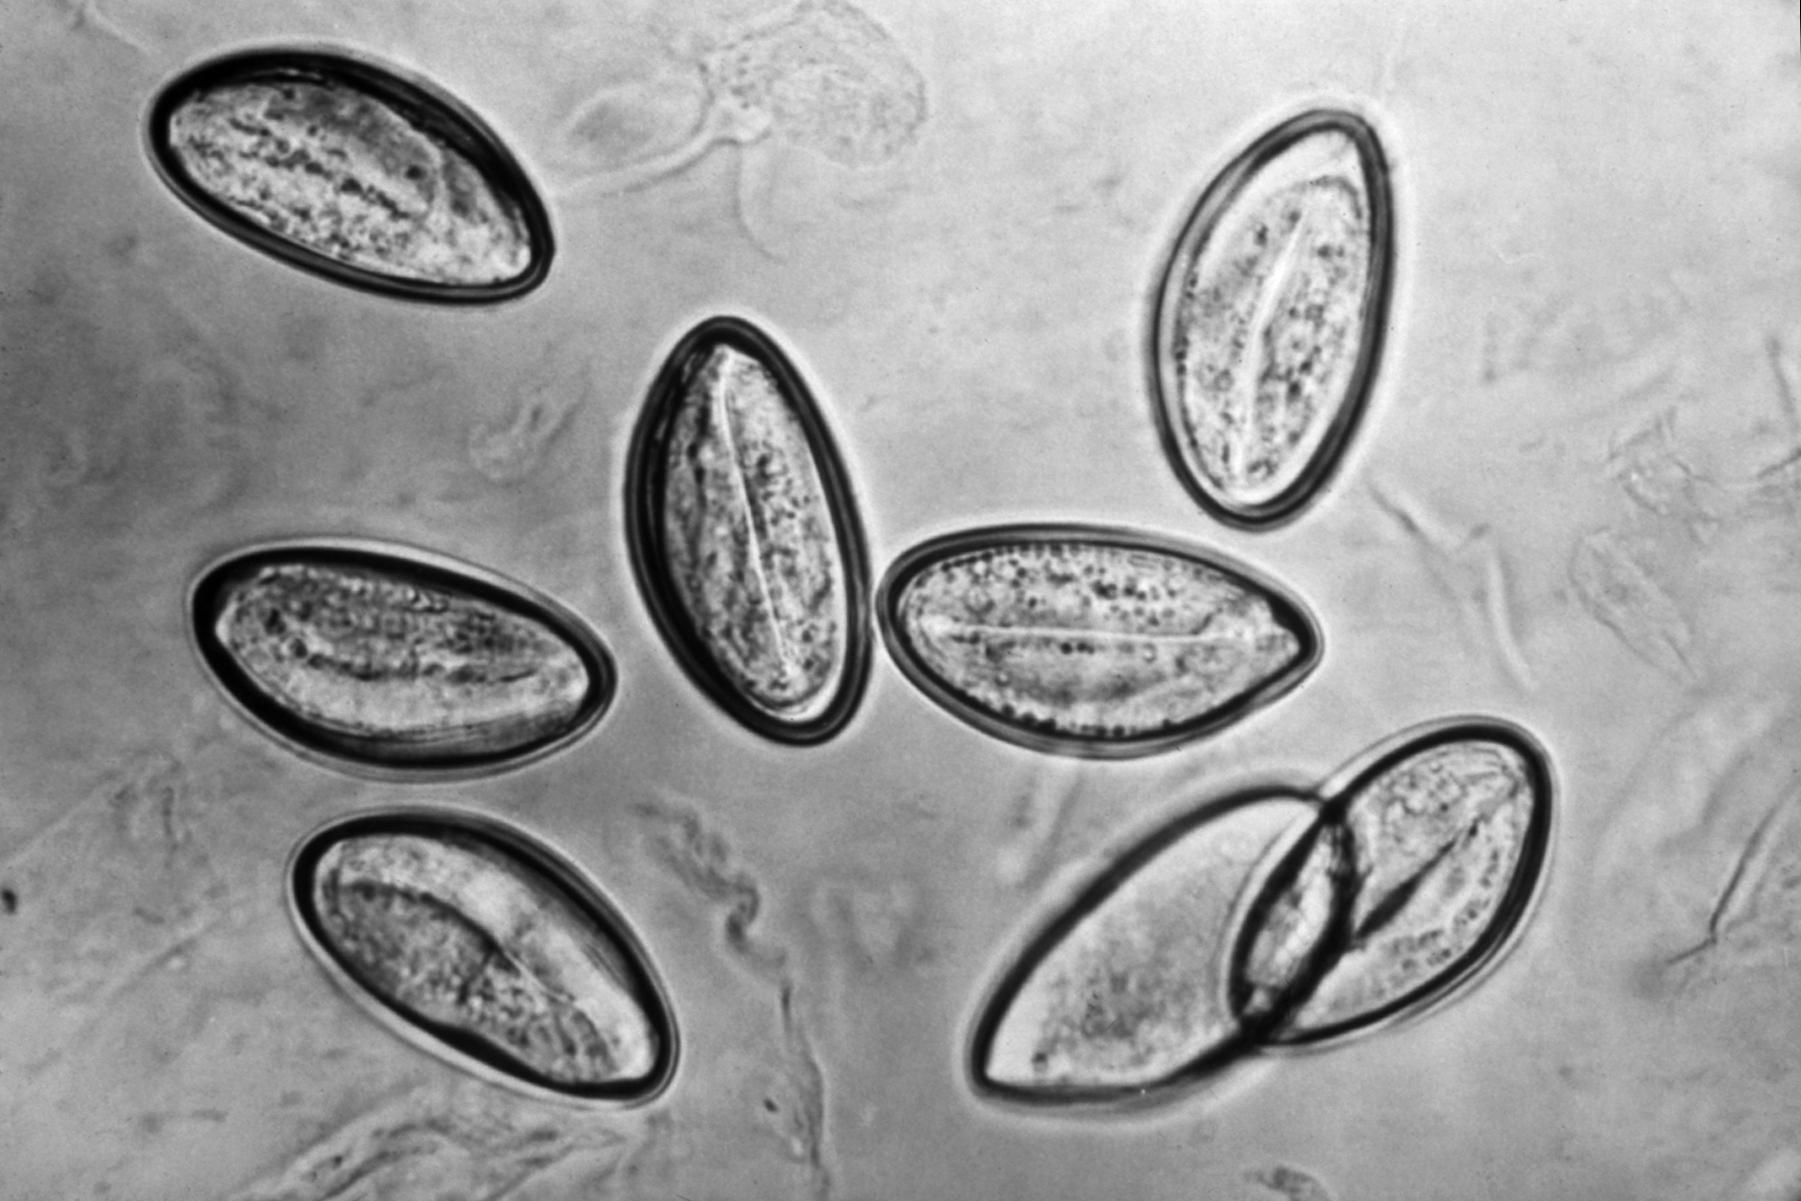 mebendazole enterobiasis